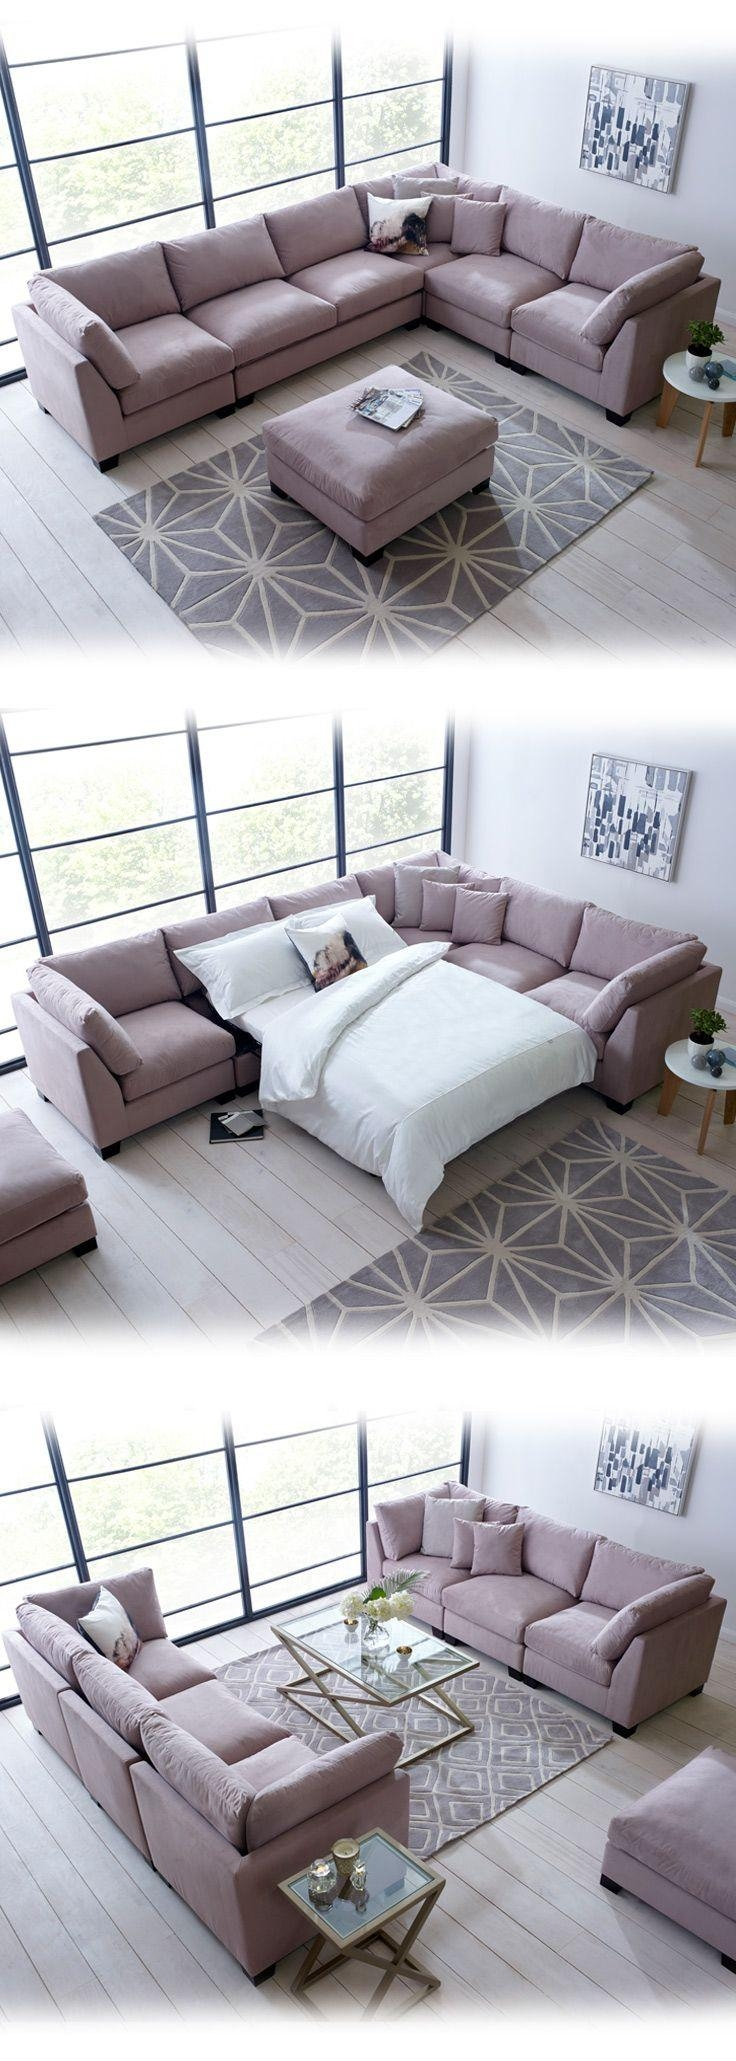 Best 25+ Corner Sofa Ideas On Pinterest | Grey Corner Sofa, White Inside Unique Corner Sofas (Image 2 of 21)